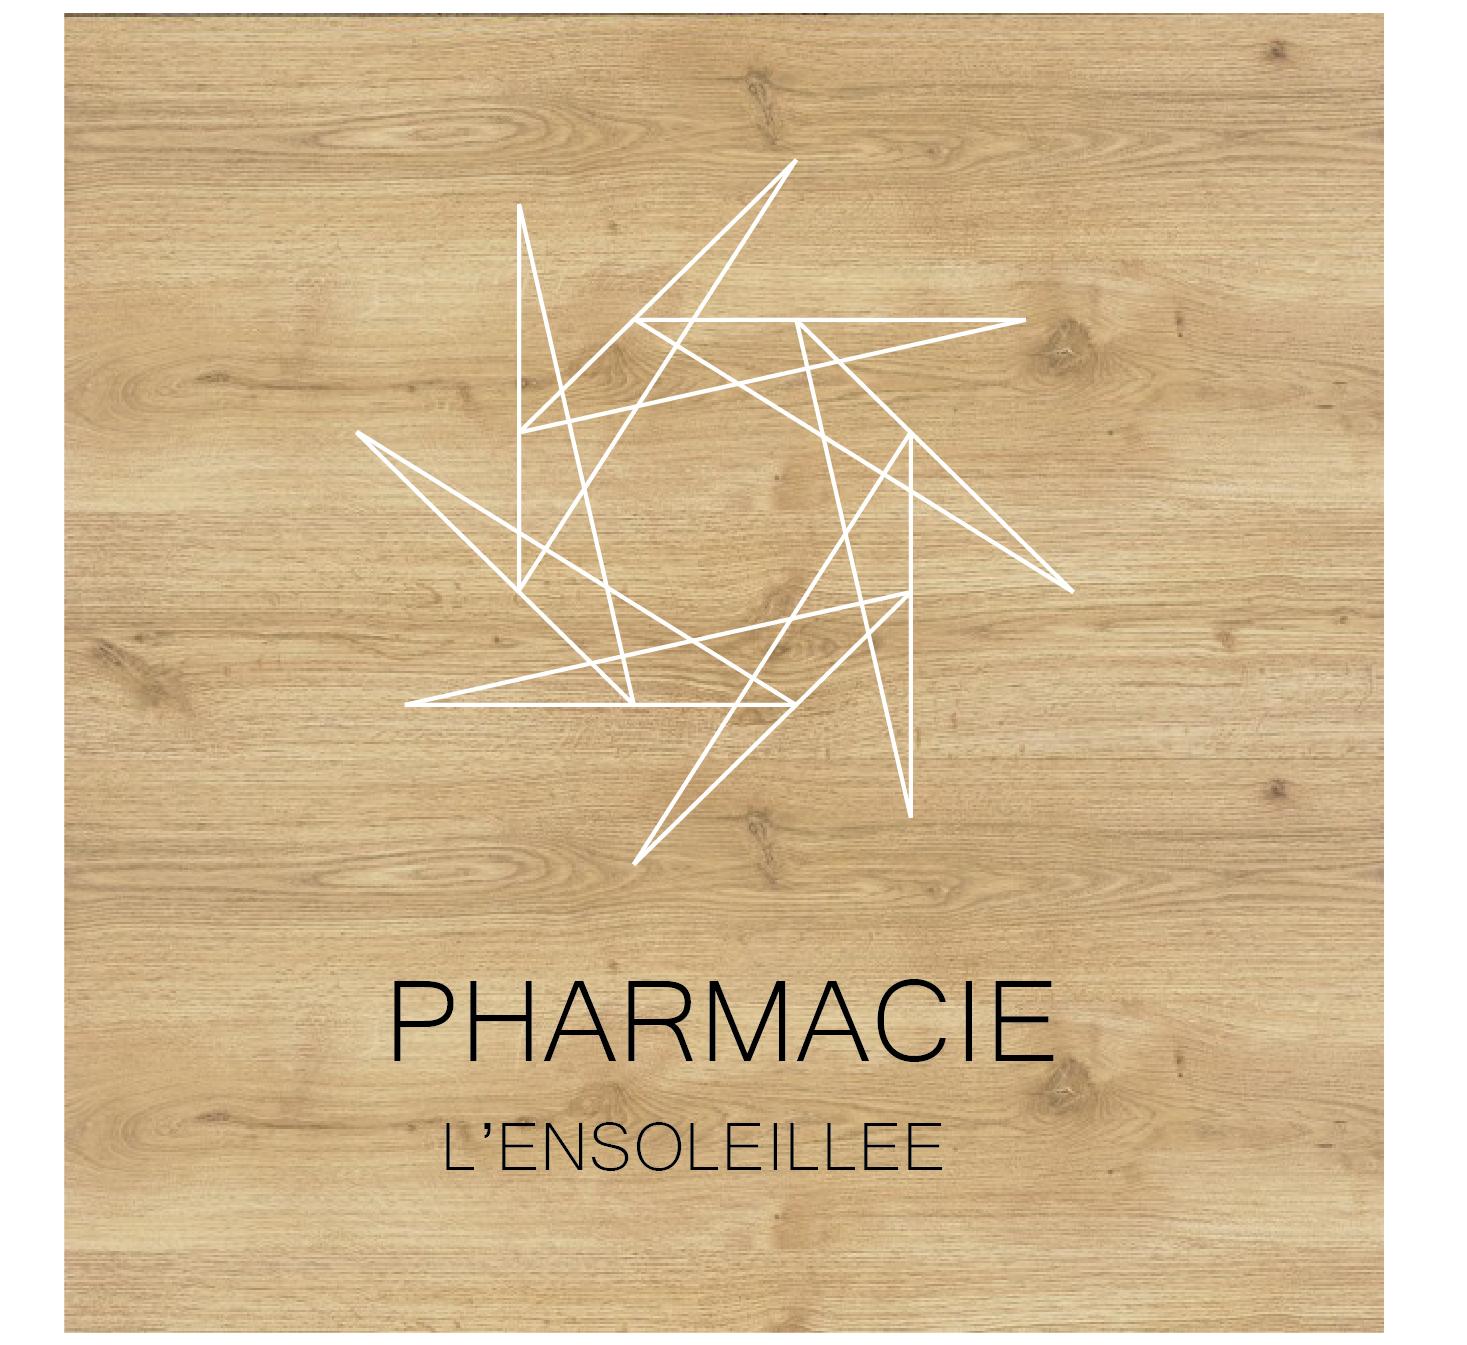 PHARMACIE L'ENSOLEILLEE –  AIX EN PROVENCE (13) 29